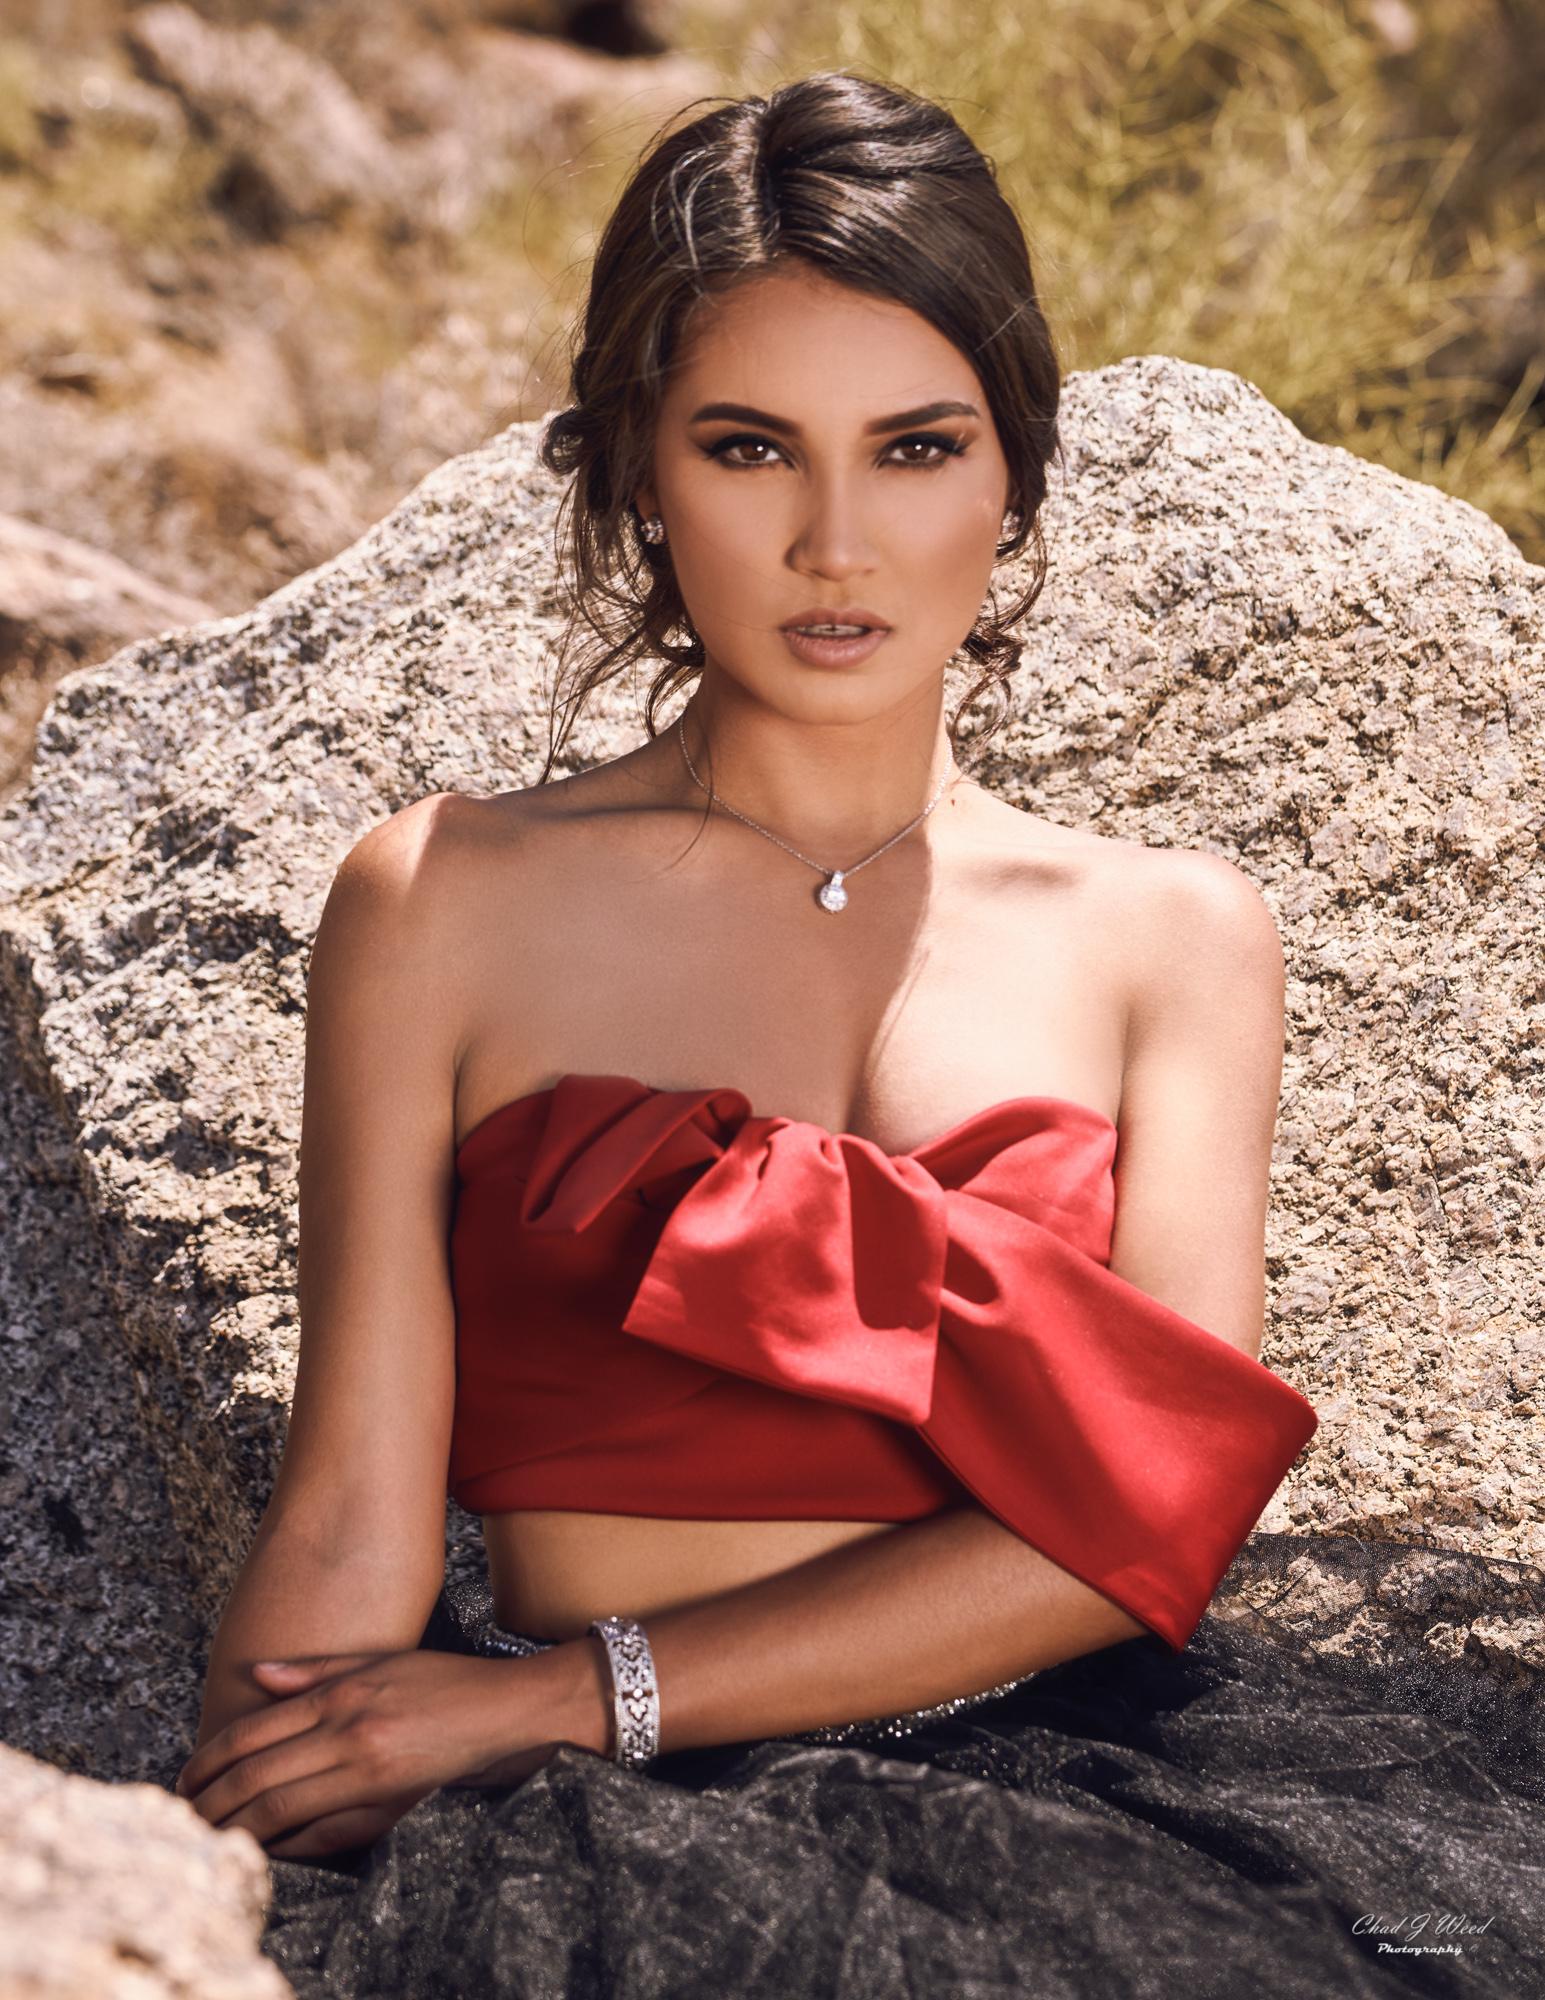 Zari Beauty Model by Mesa Arizona Beauty Photographer Chad Weed